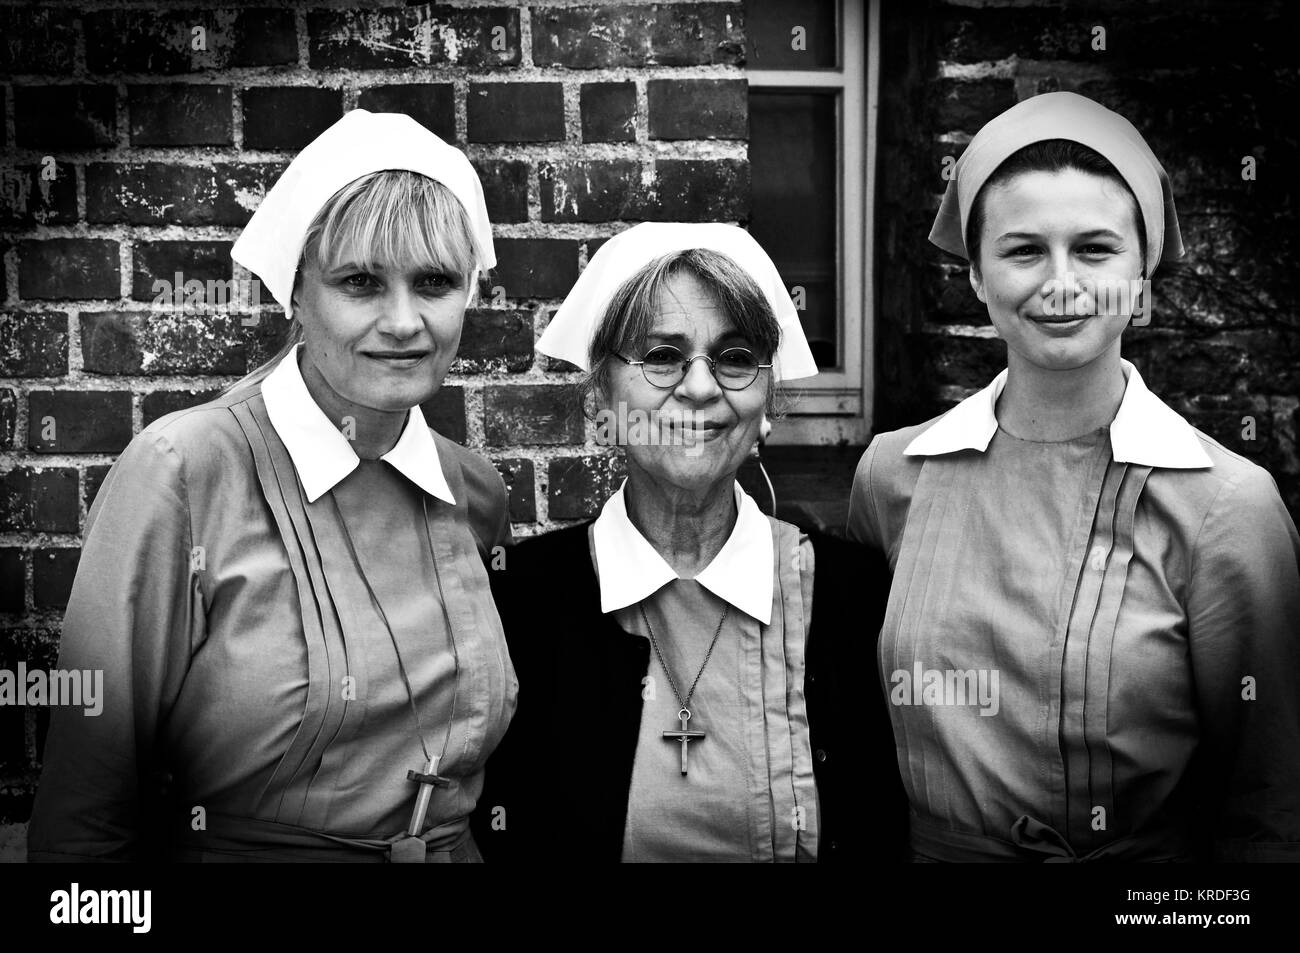 "ARD- Dreharbeiten ""eine halbe Ewigkeit"": EUROPA, Alemanha, LUENEBURG, 13,07.2010: Ulrike Grote, Cornelia Imagens de Stock"